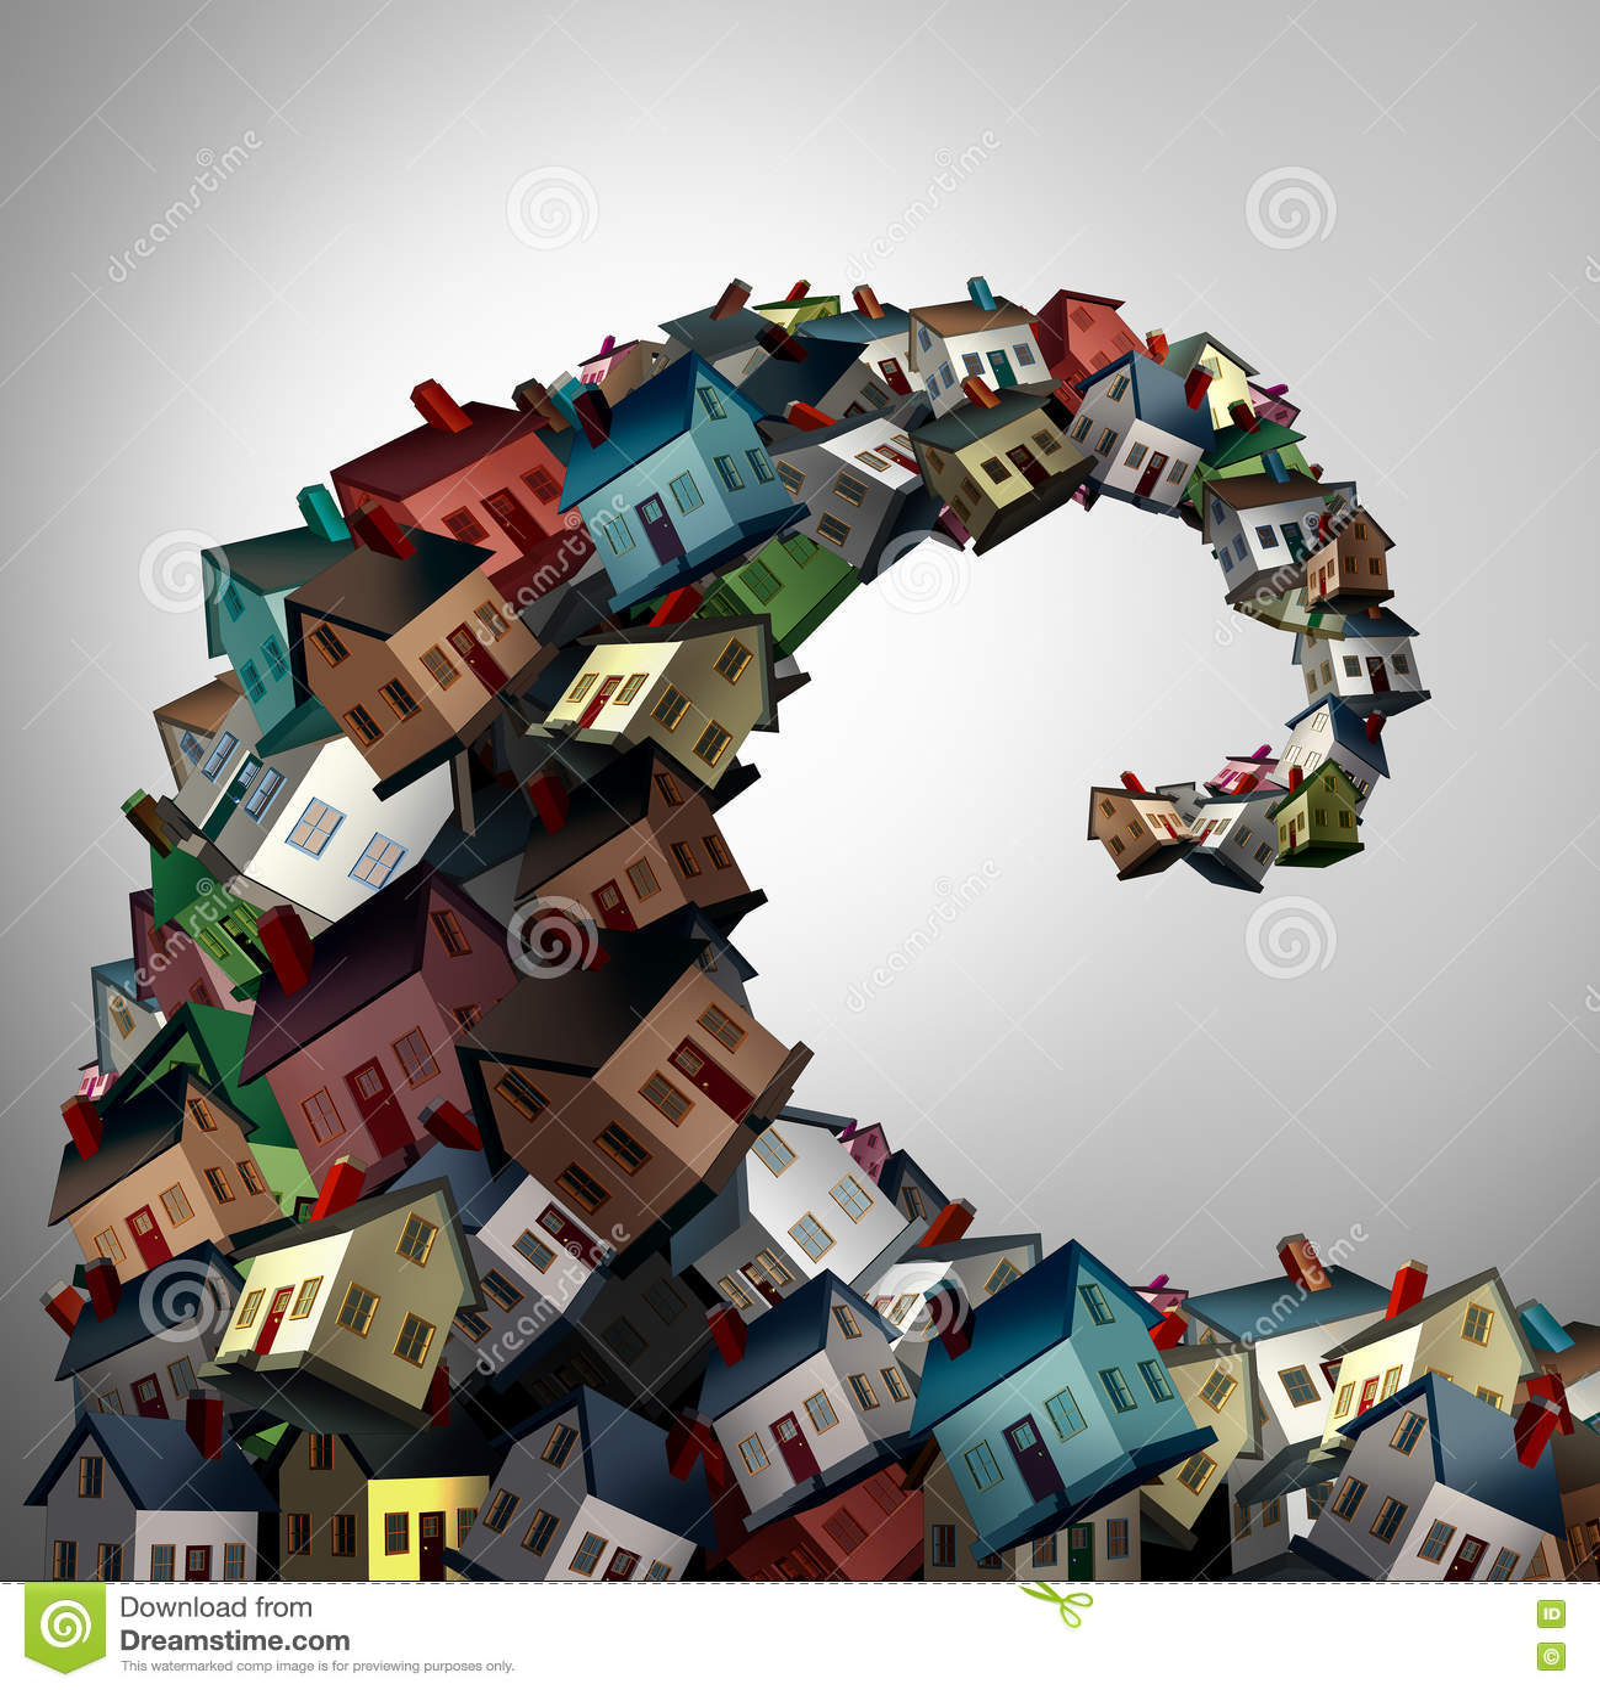 Housing Crisis Concept